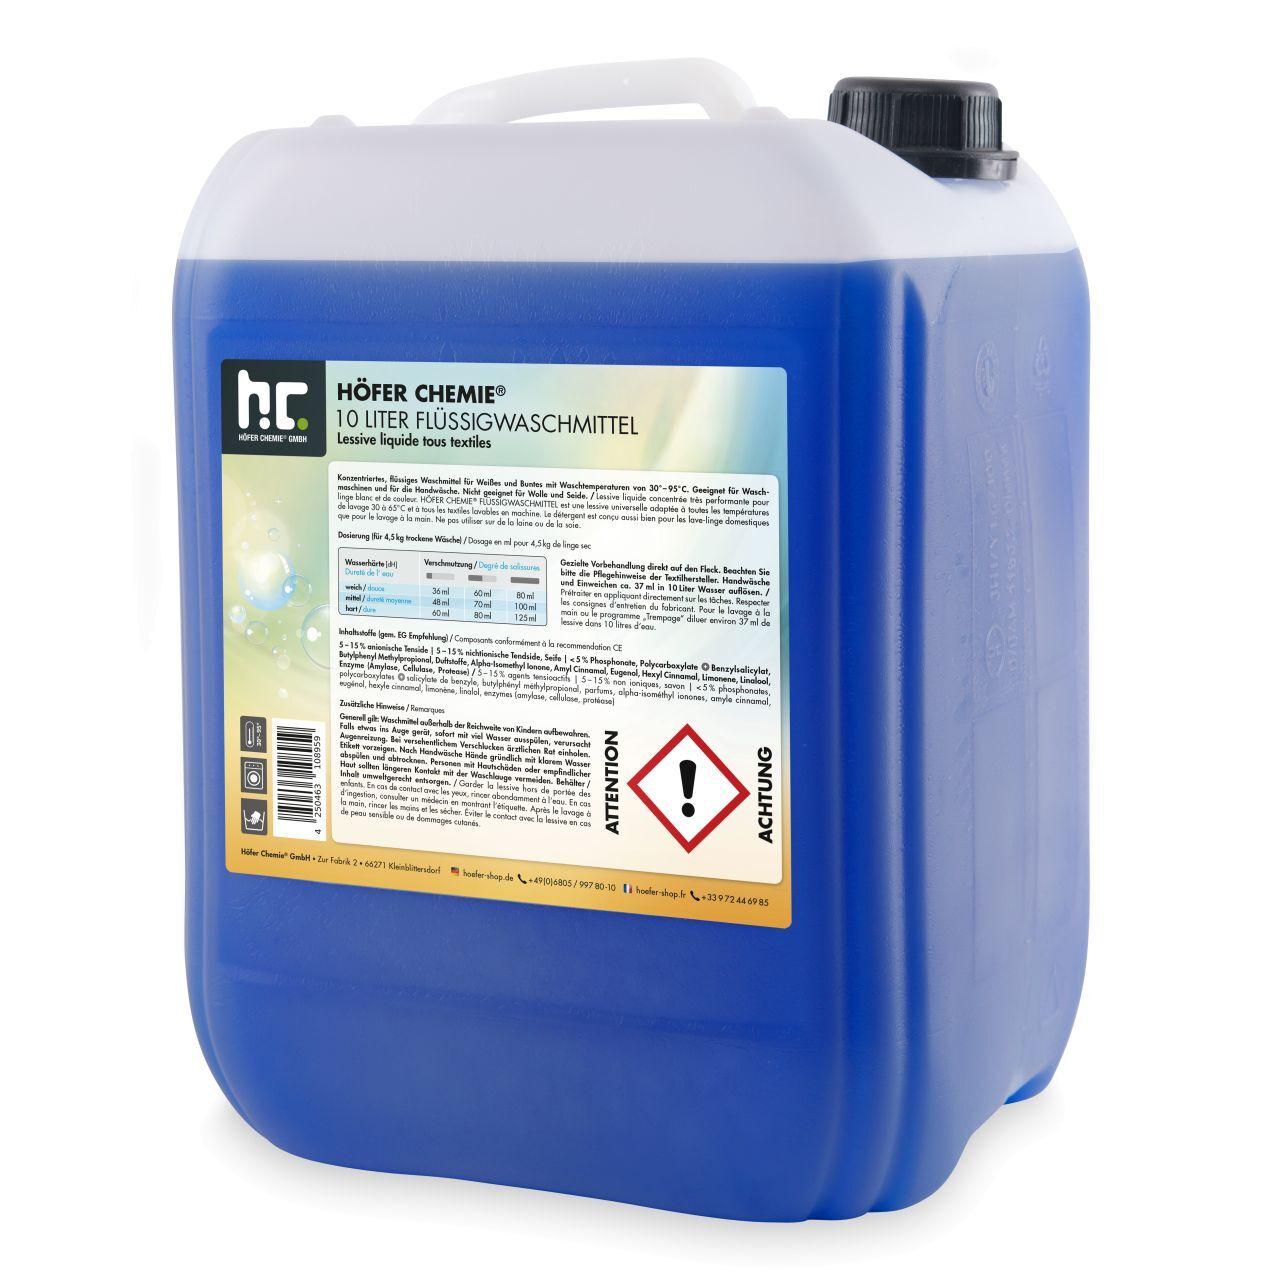 Höfer Chemie 40 l Lessive liquide (4 x 10 l)